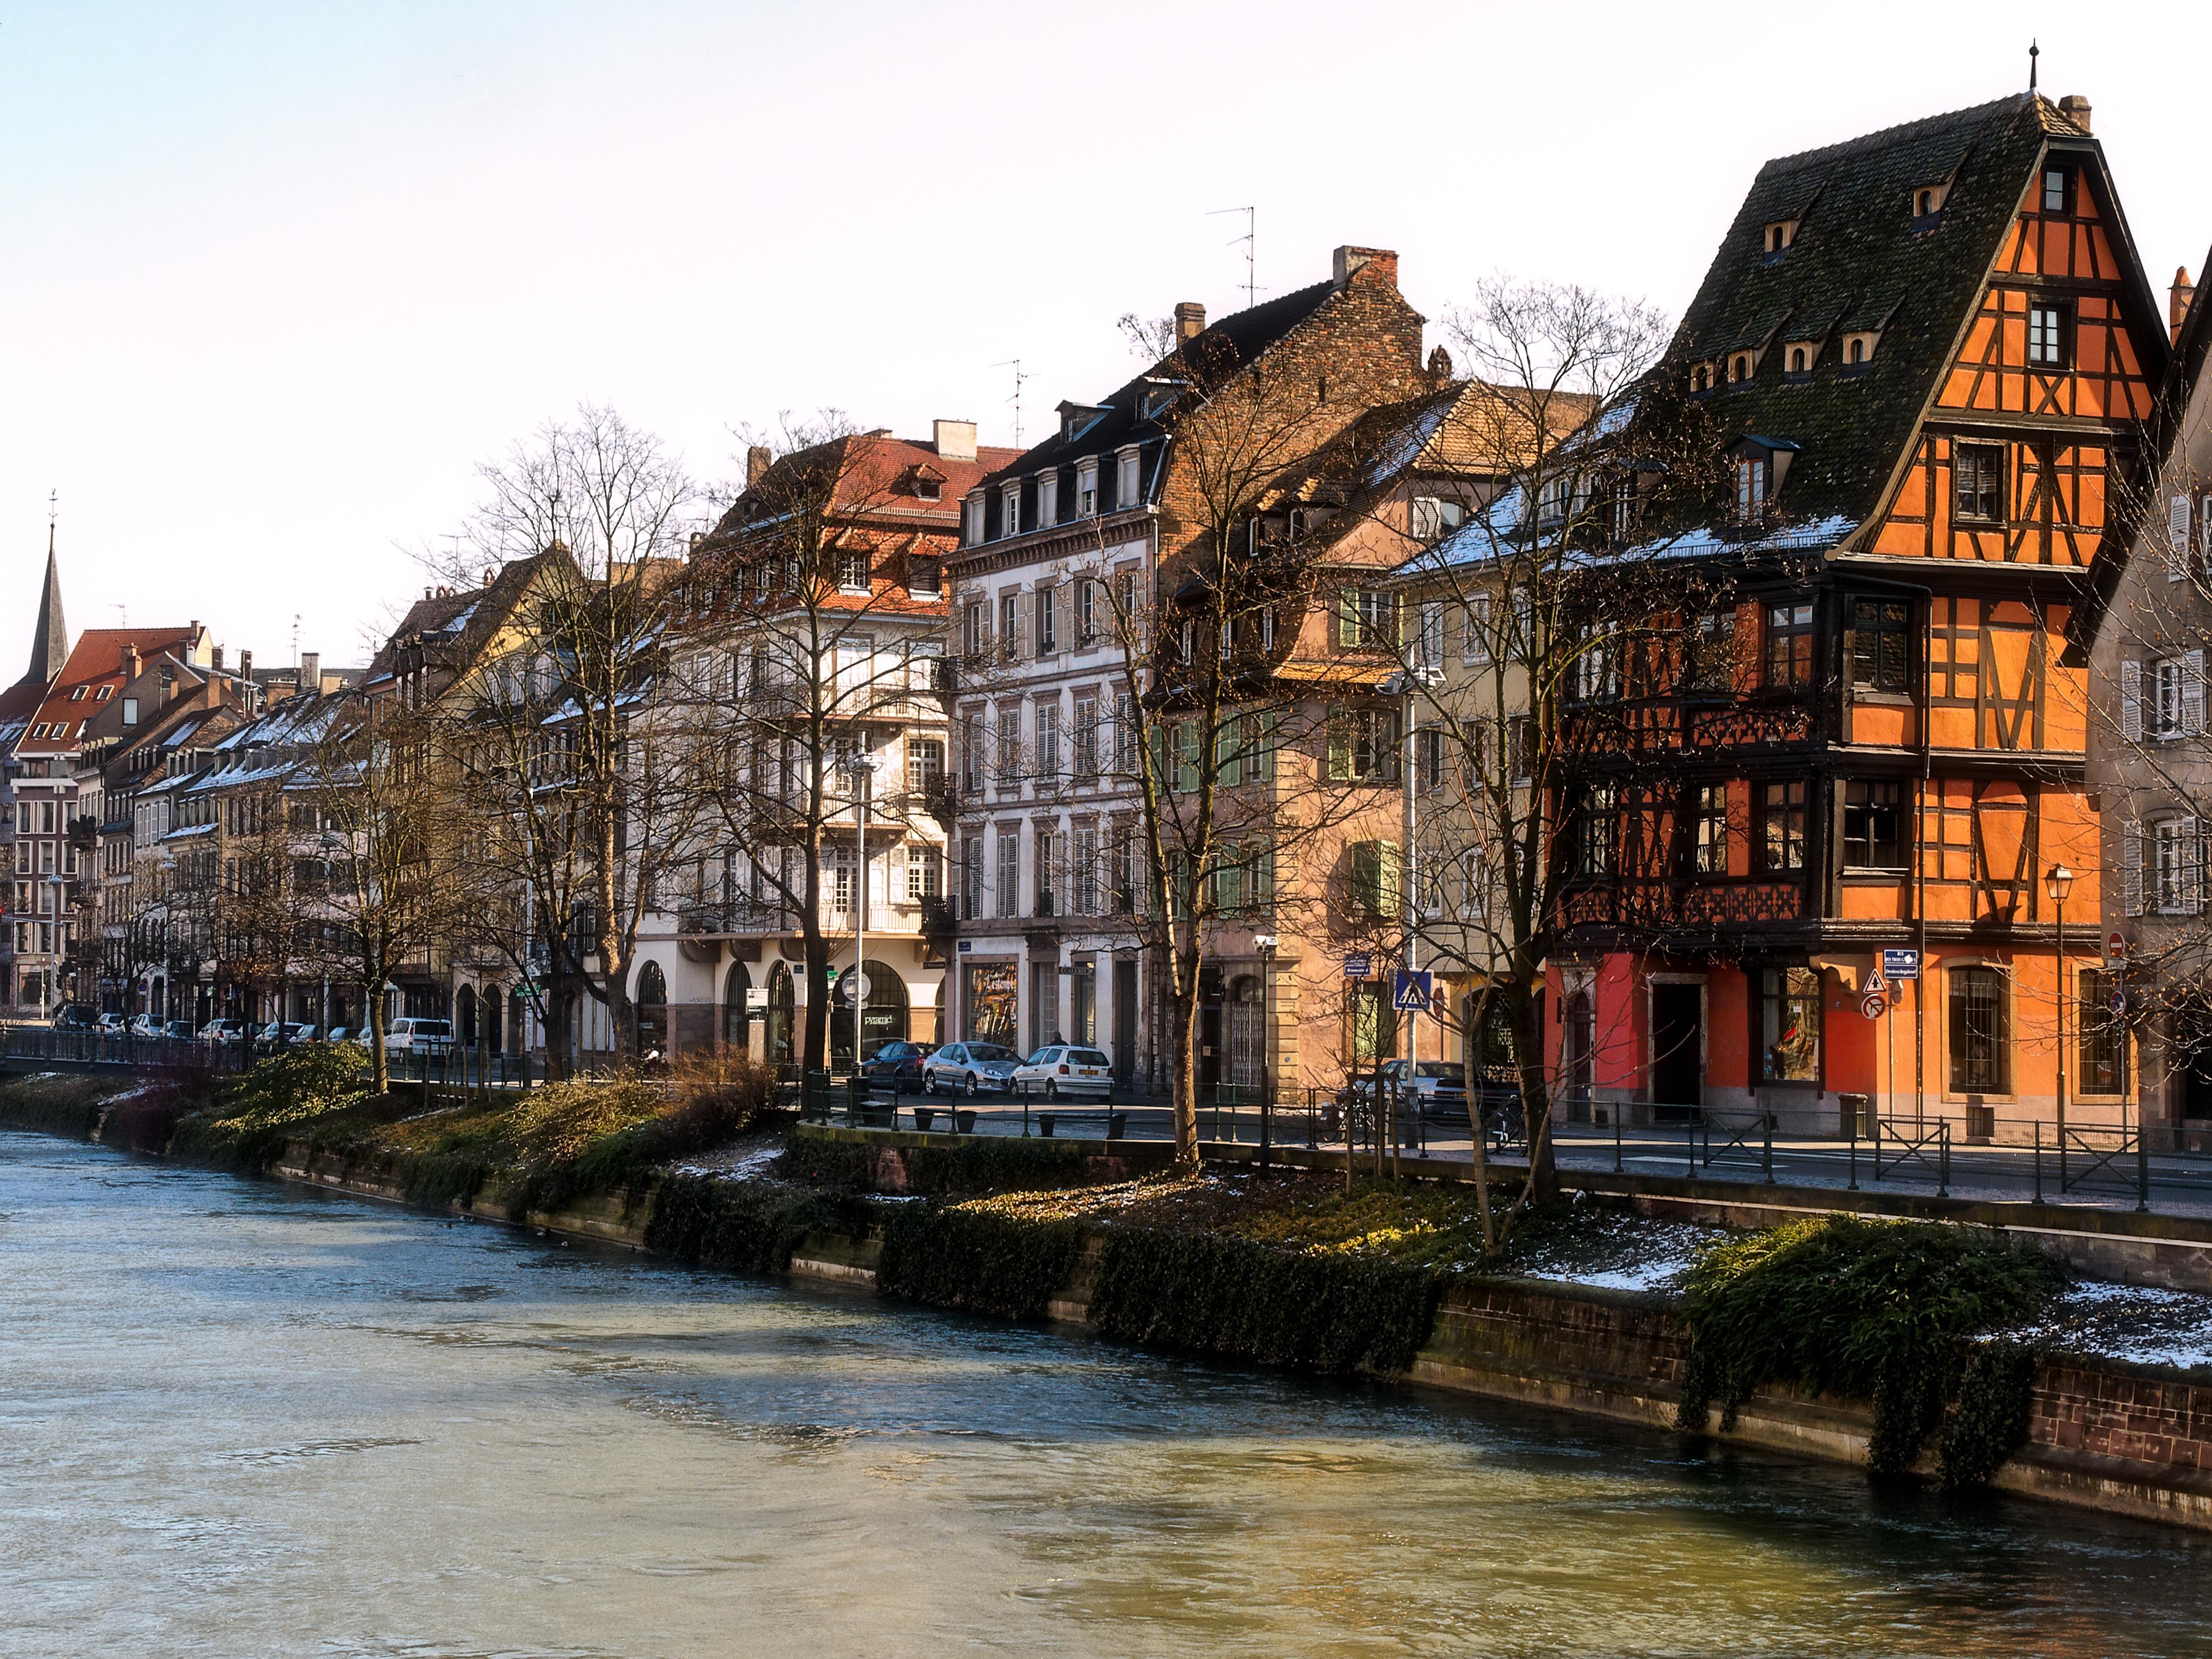 Strasbourg_Quai_des_Bateliers